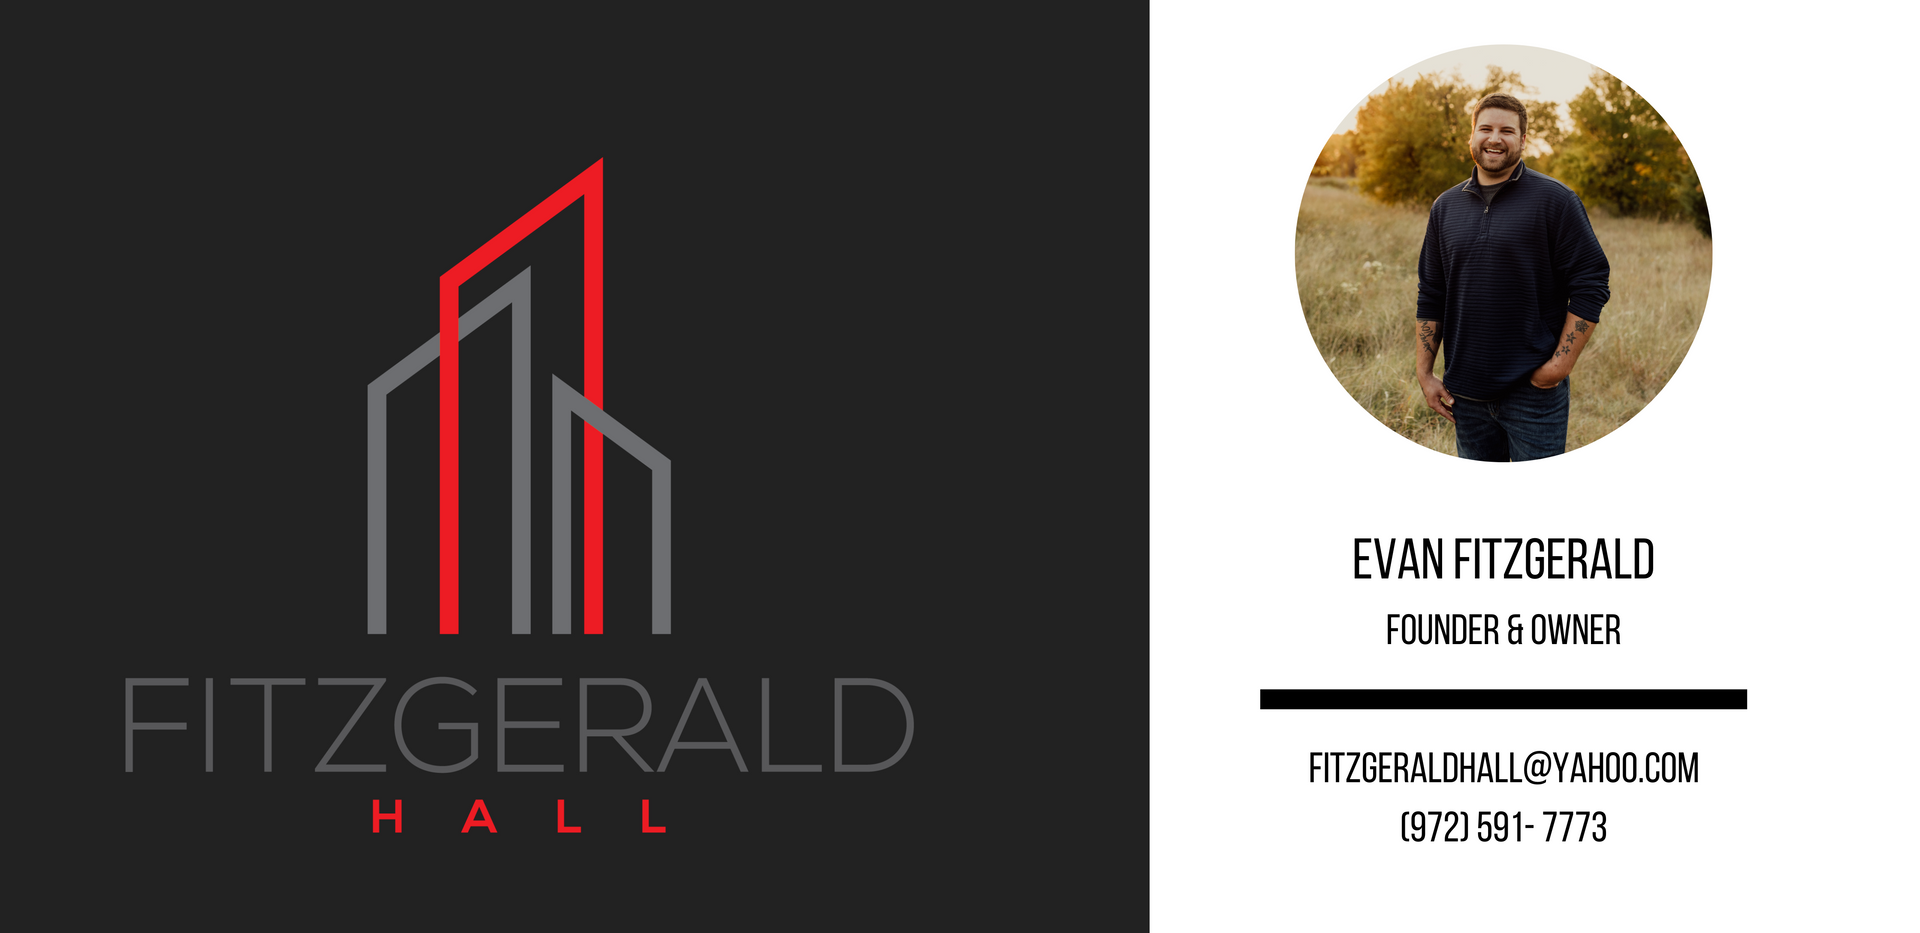 Evan Fitzgerald - Owner